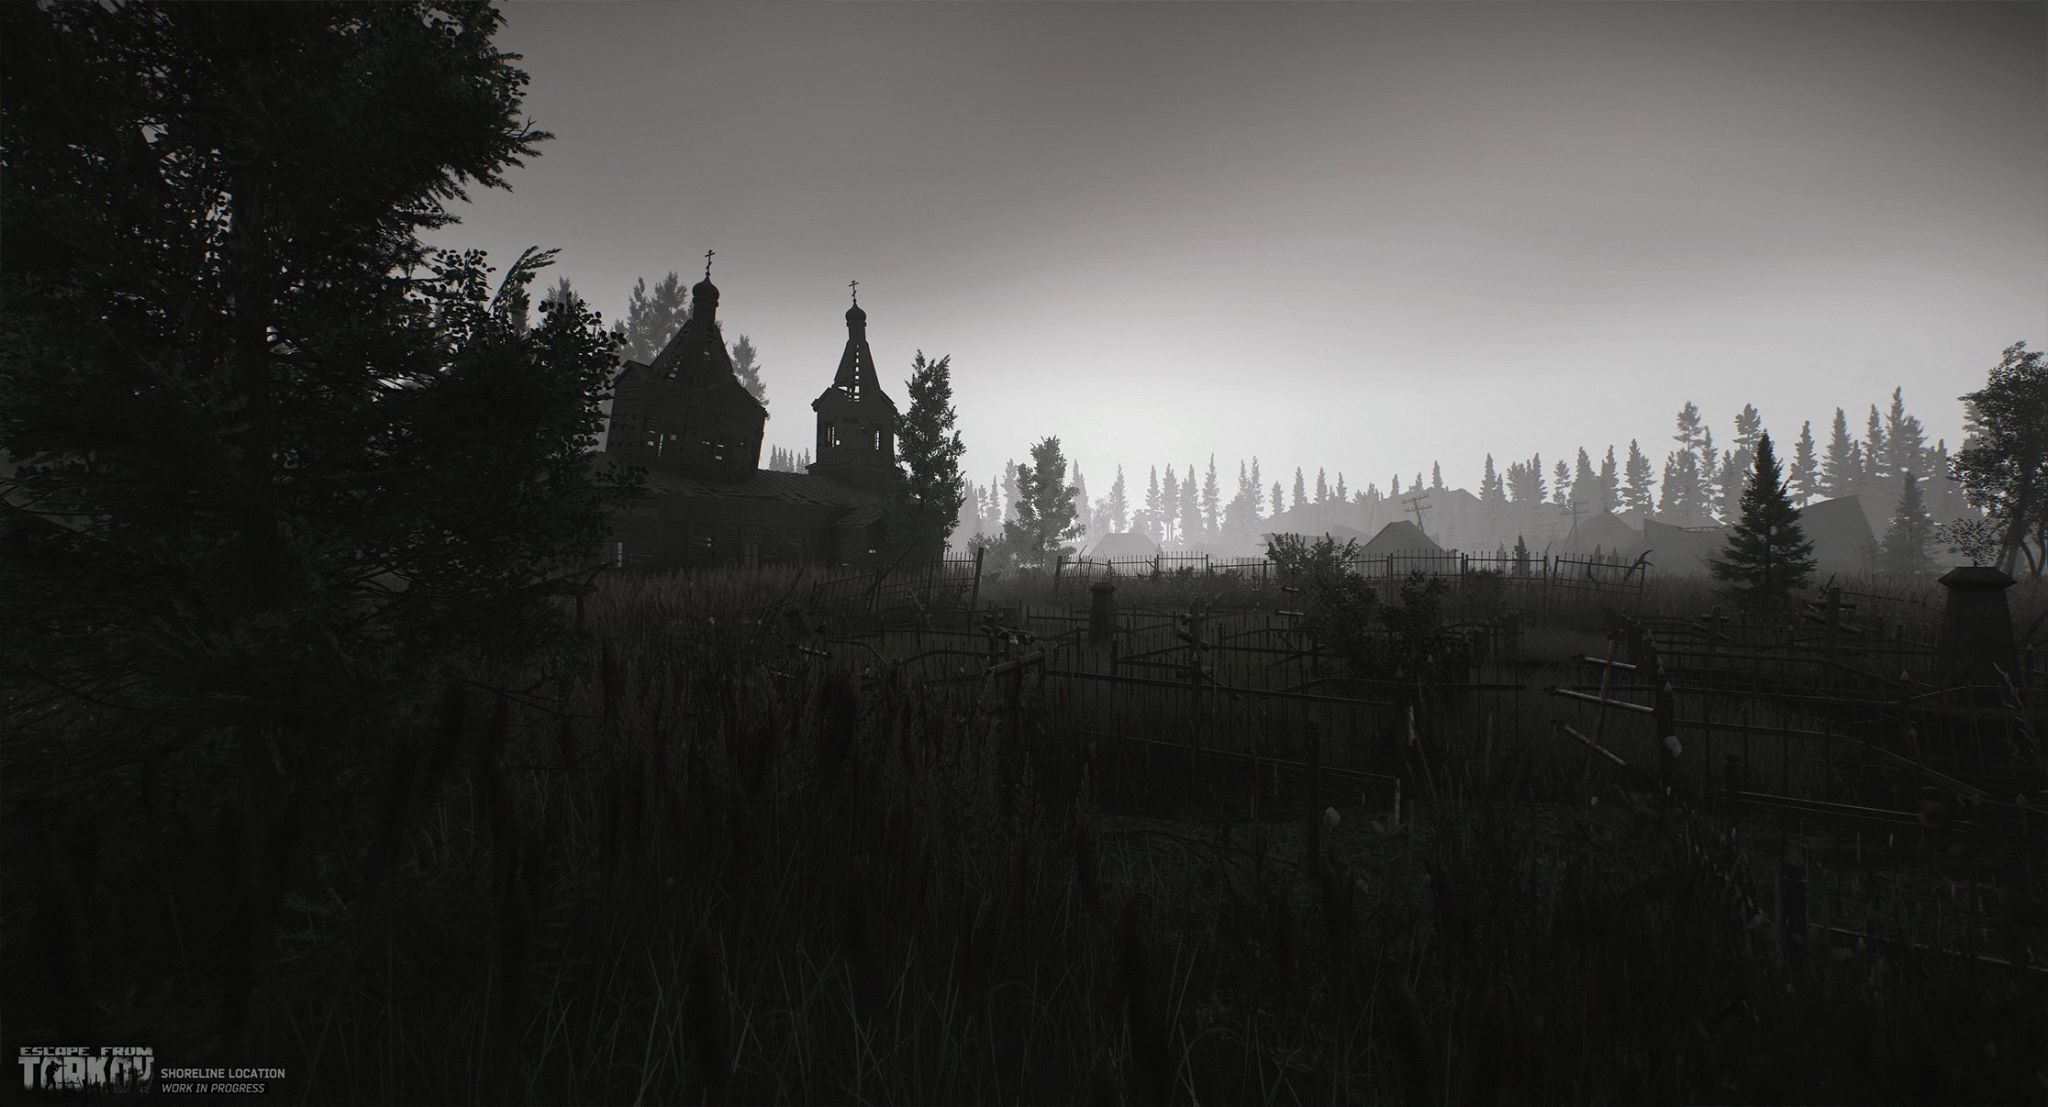 Escape from Tarkov - New beautiful screenshots showcase the